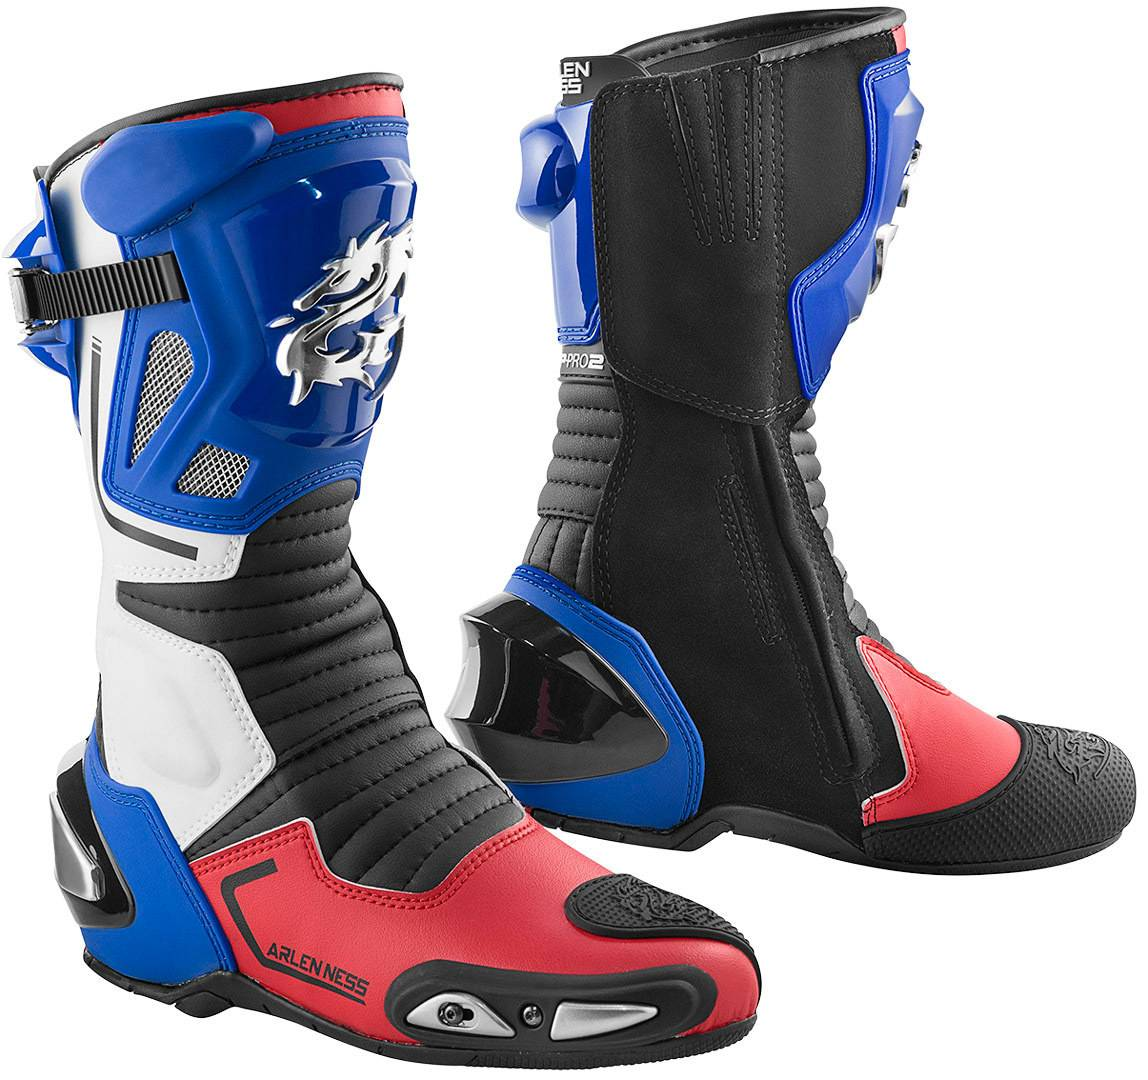 Arlen Ness Sugello Bottes de moto Blanc Rouge Bleu taille : 43